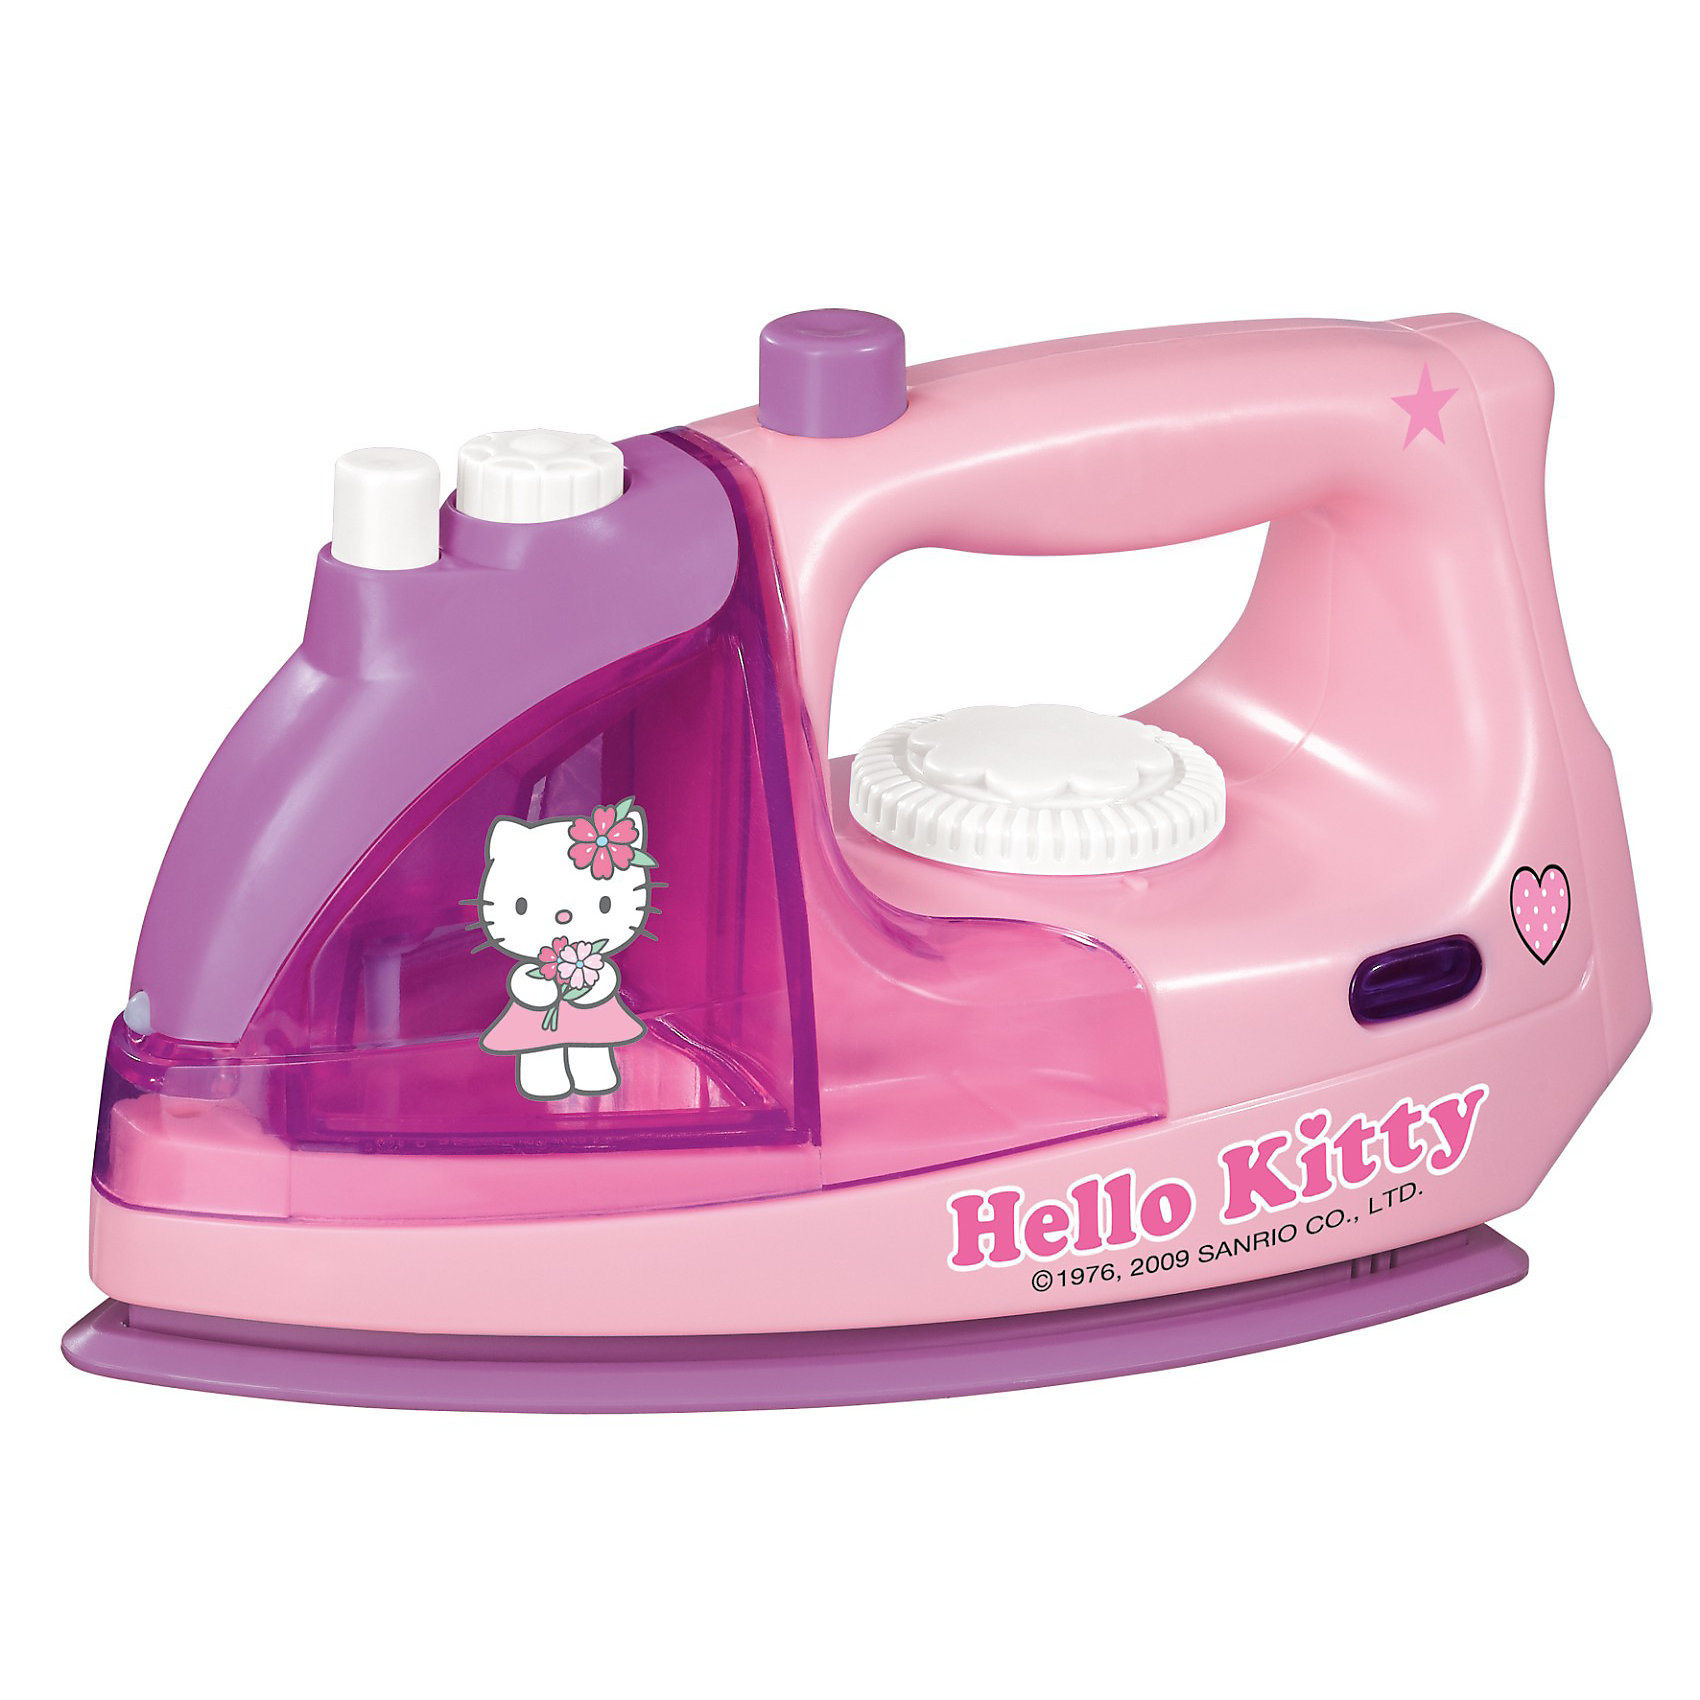 Simba Simba Утюг Hello Kitty, 12/24 simba simba губная гармошка hello kitty